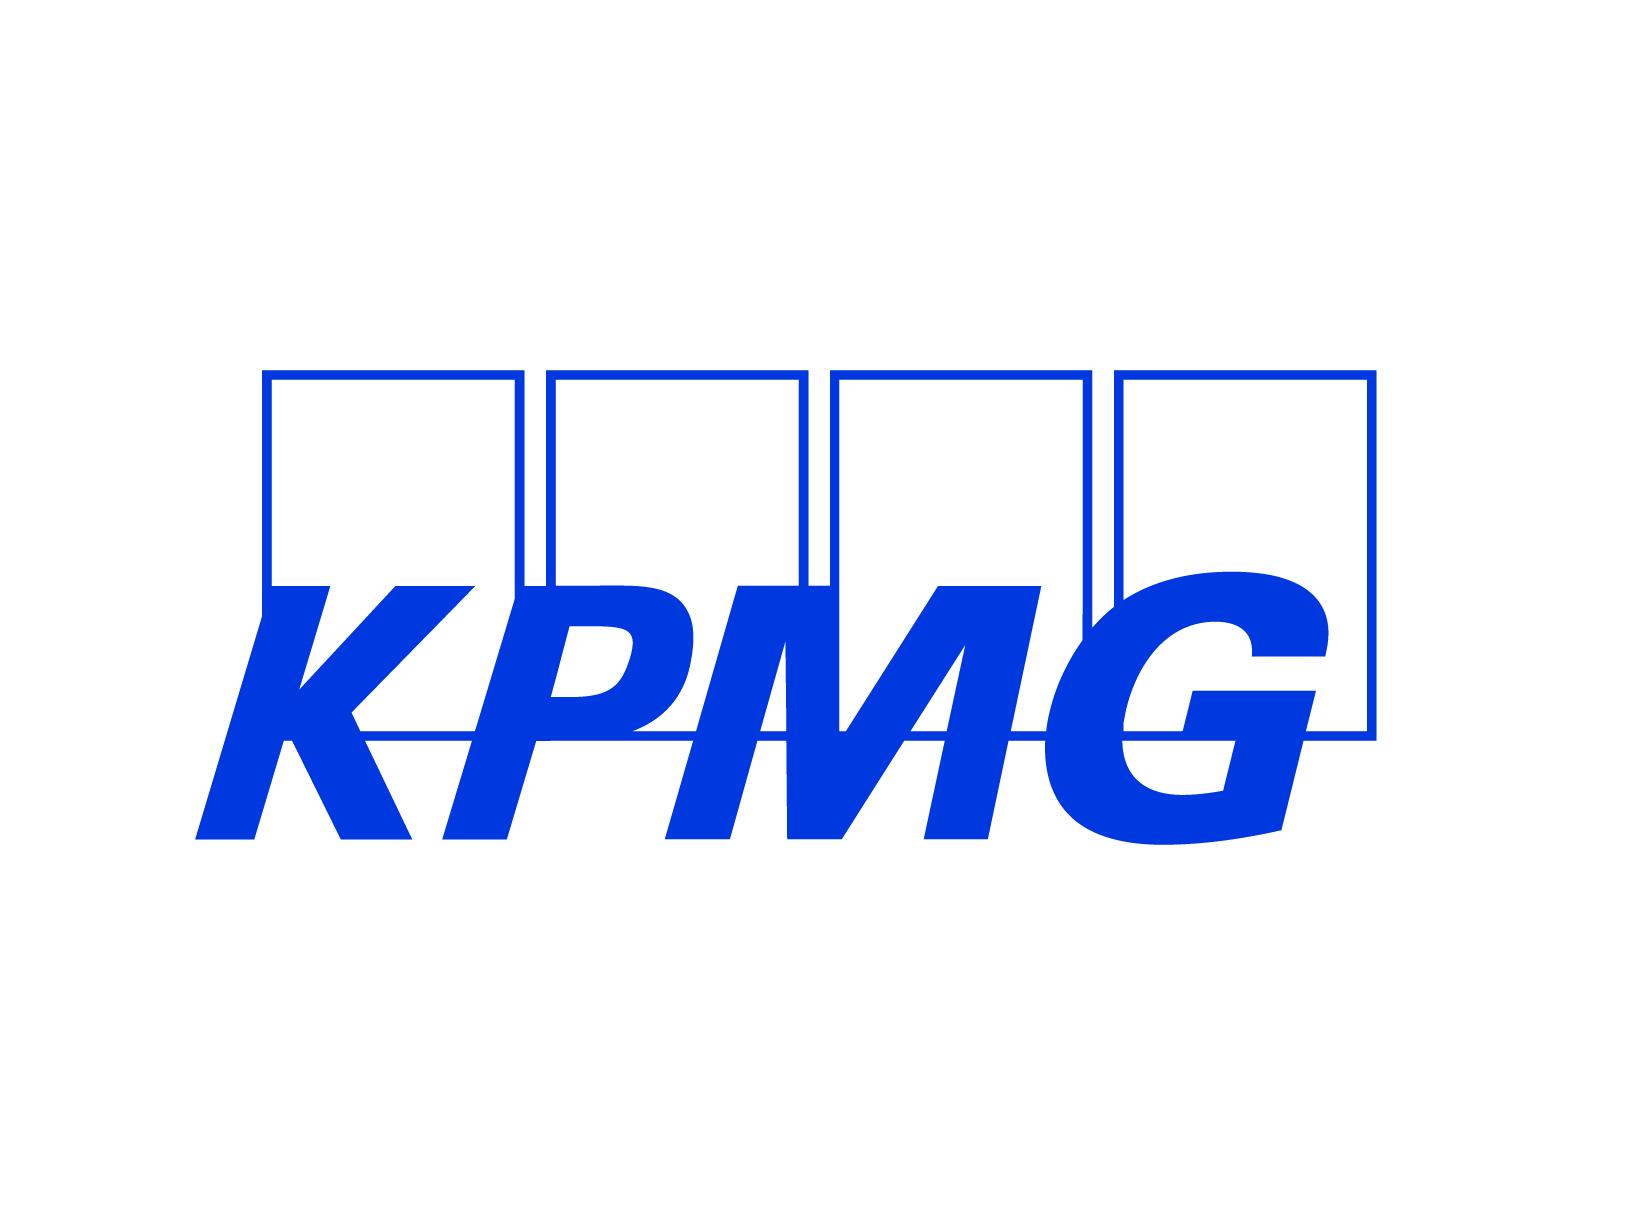 KPMG Blue Logo